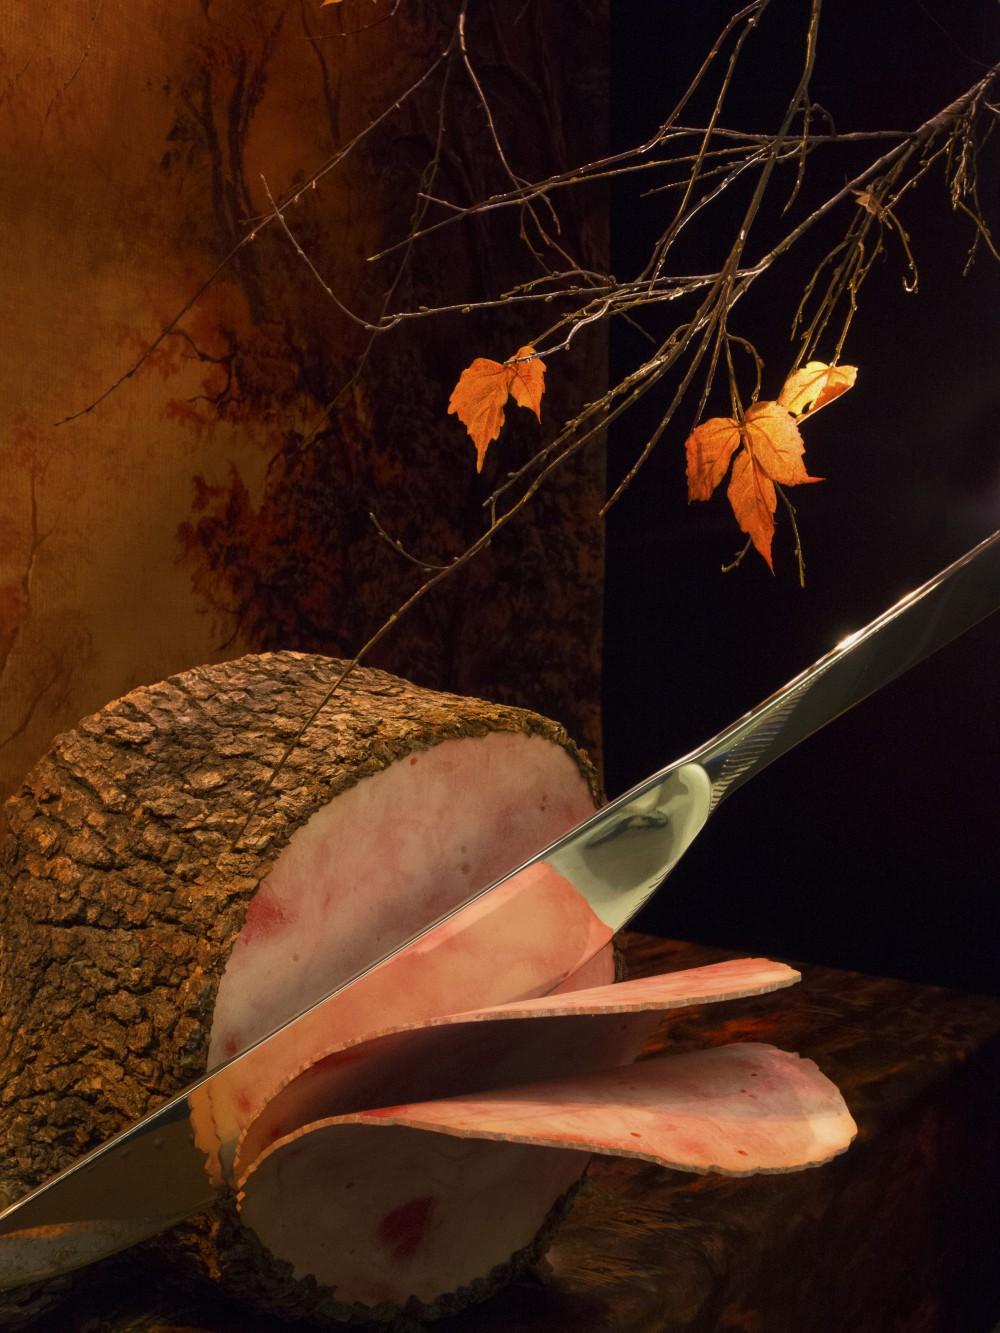 GSIX_Autumn 「Taste of Appreciation」